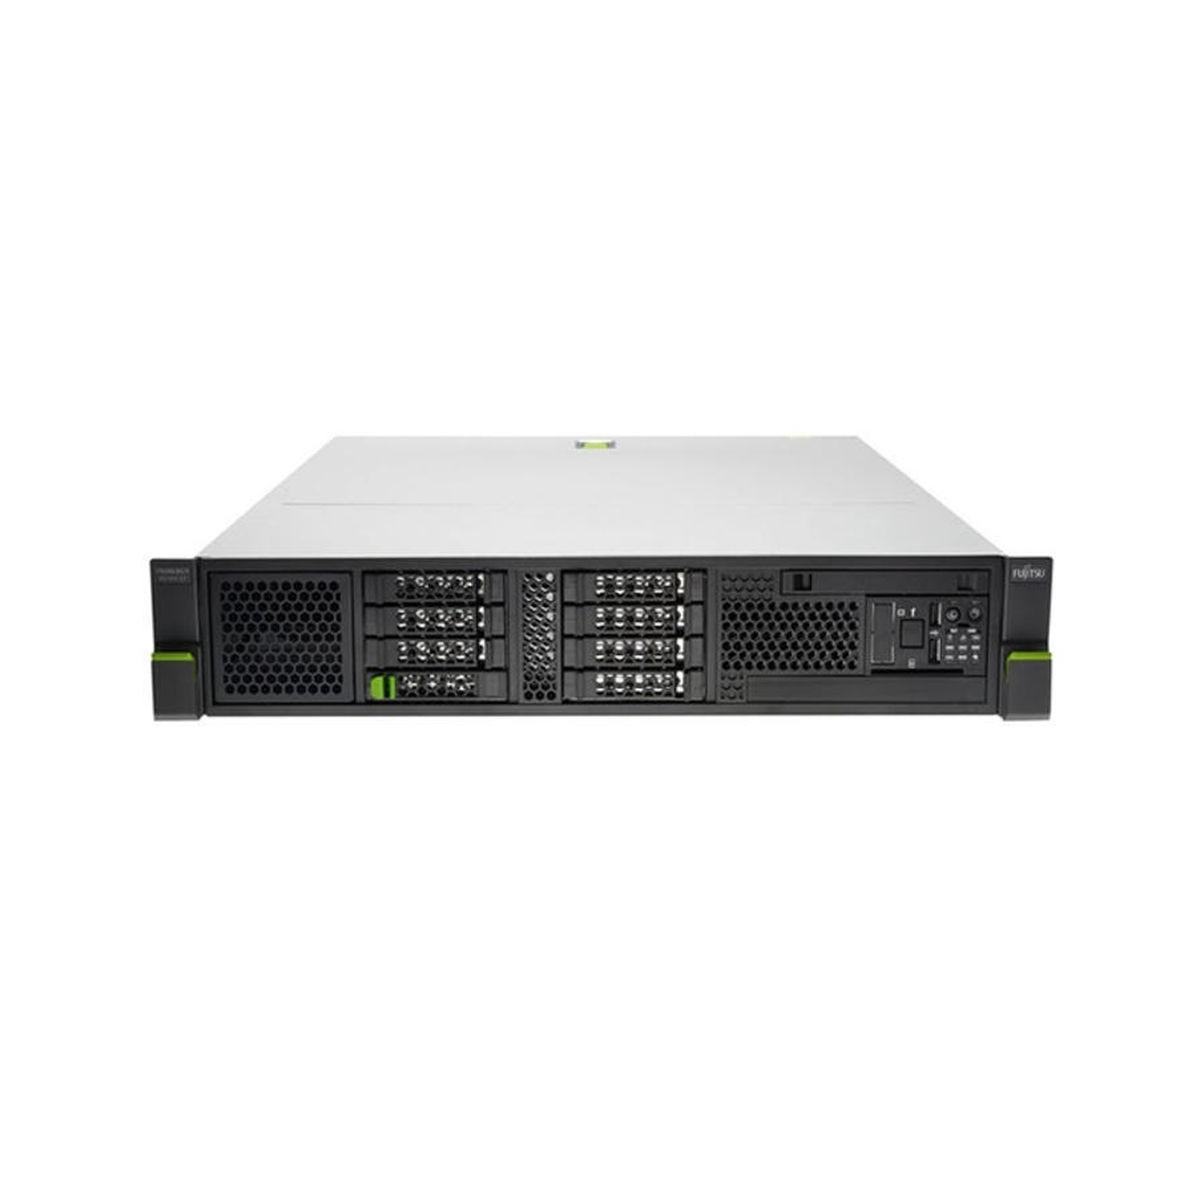 FUJITSU RX300 S7 E5-2640 6C 32GB 2x300GB SAS D3116